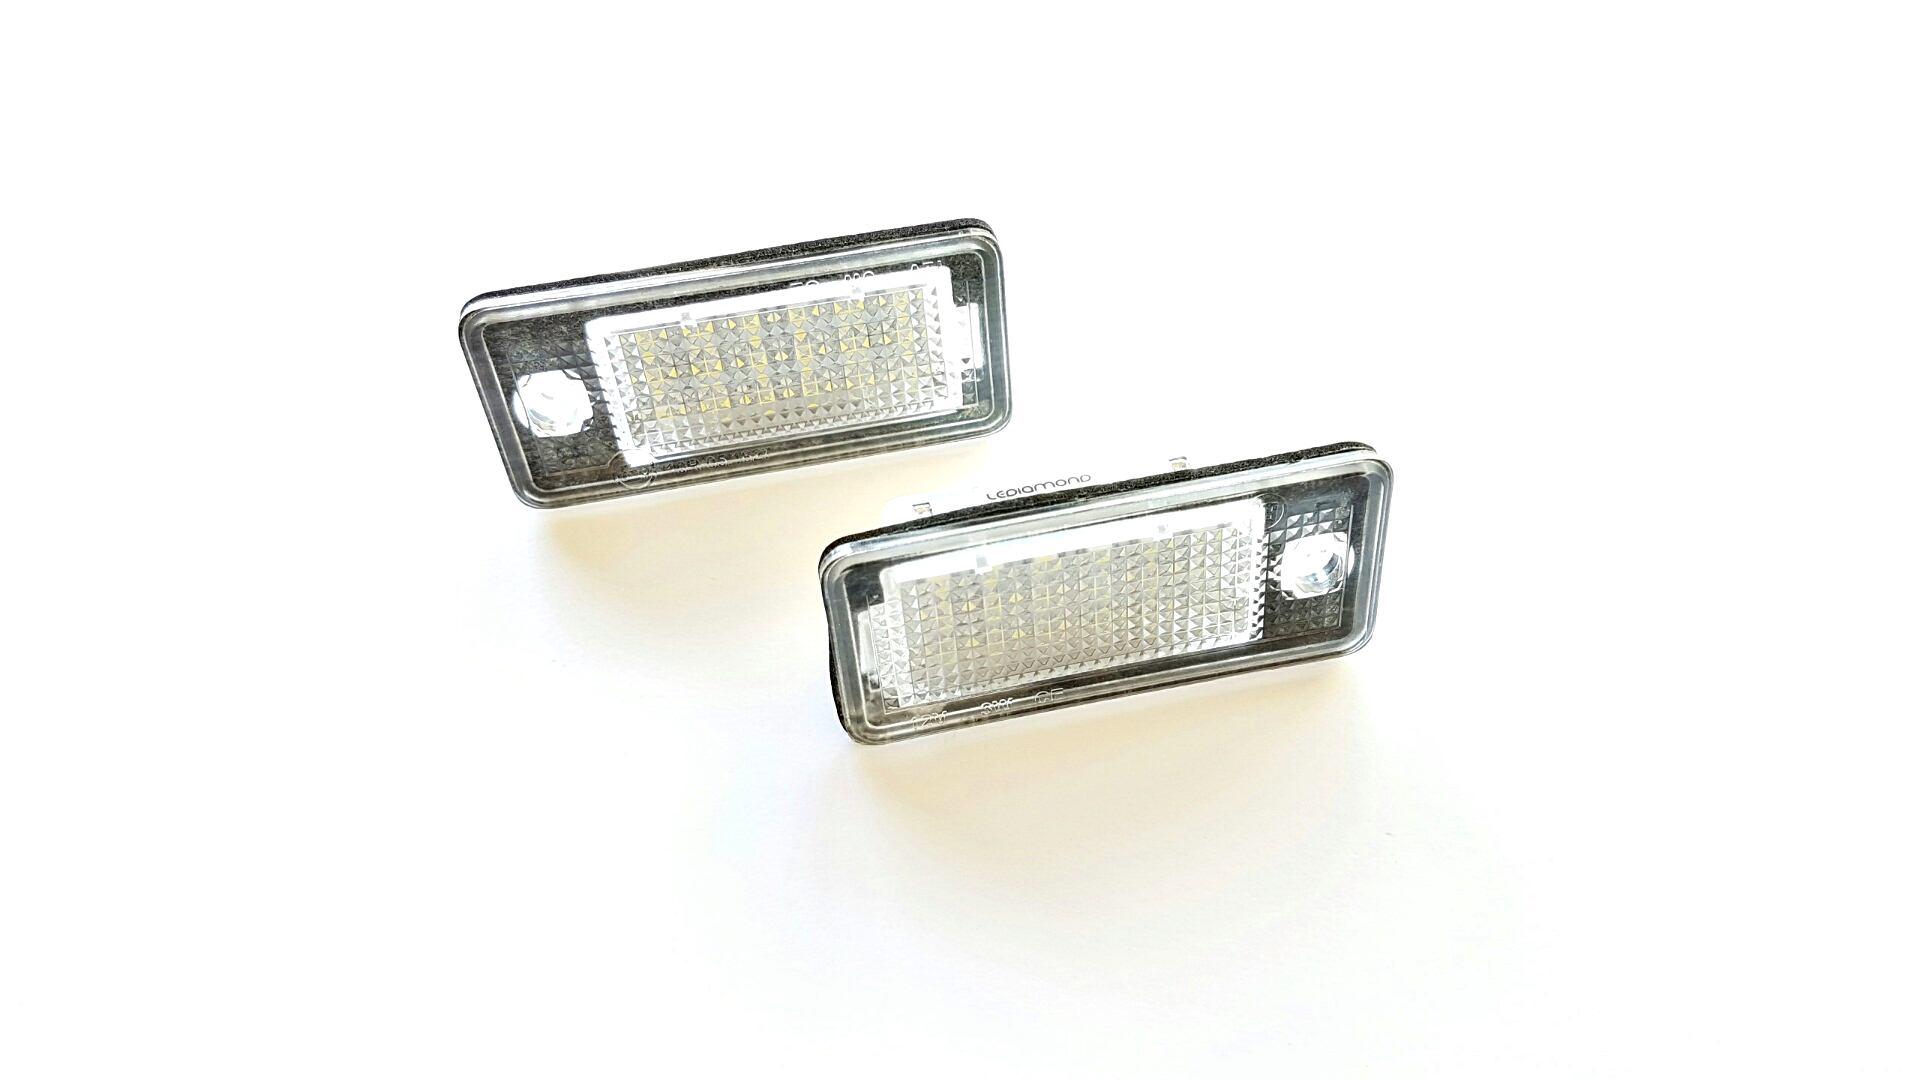 PLAFONES MATRICULA LED AUDI A3 A4 A5 A6 A8 Q7 RS4 LEDIAMOND LMD030804